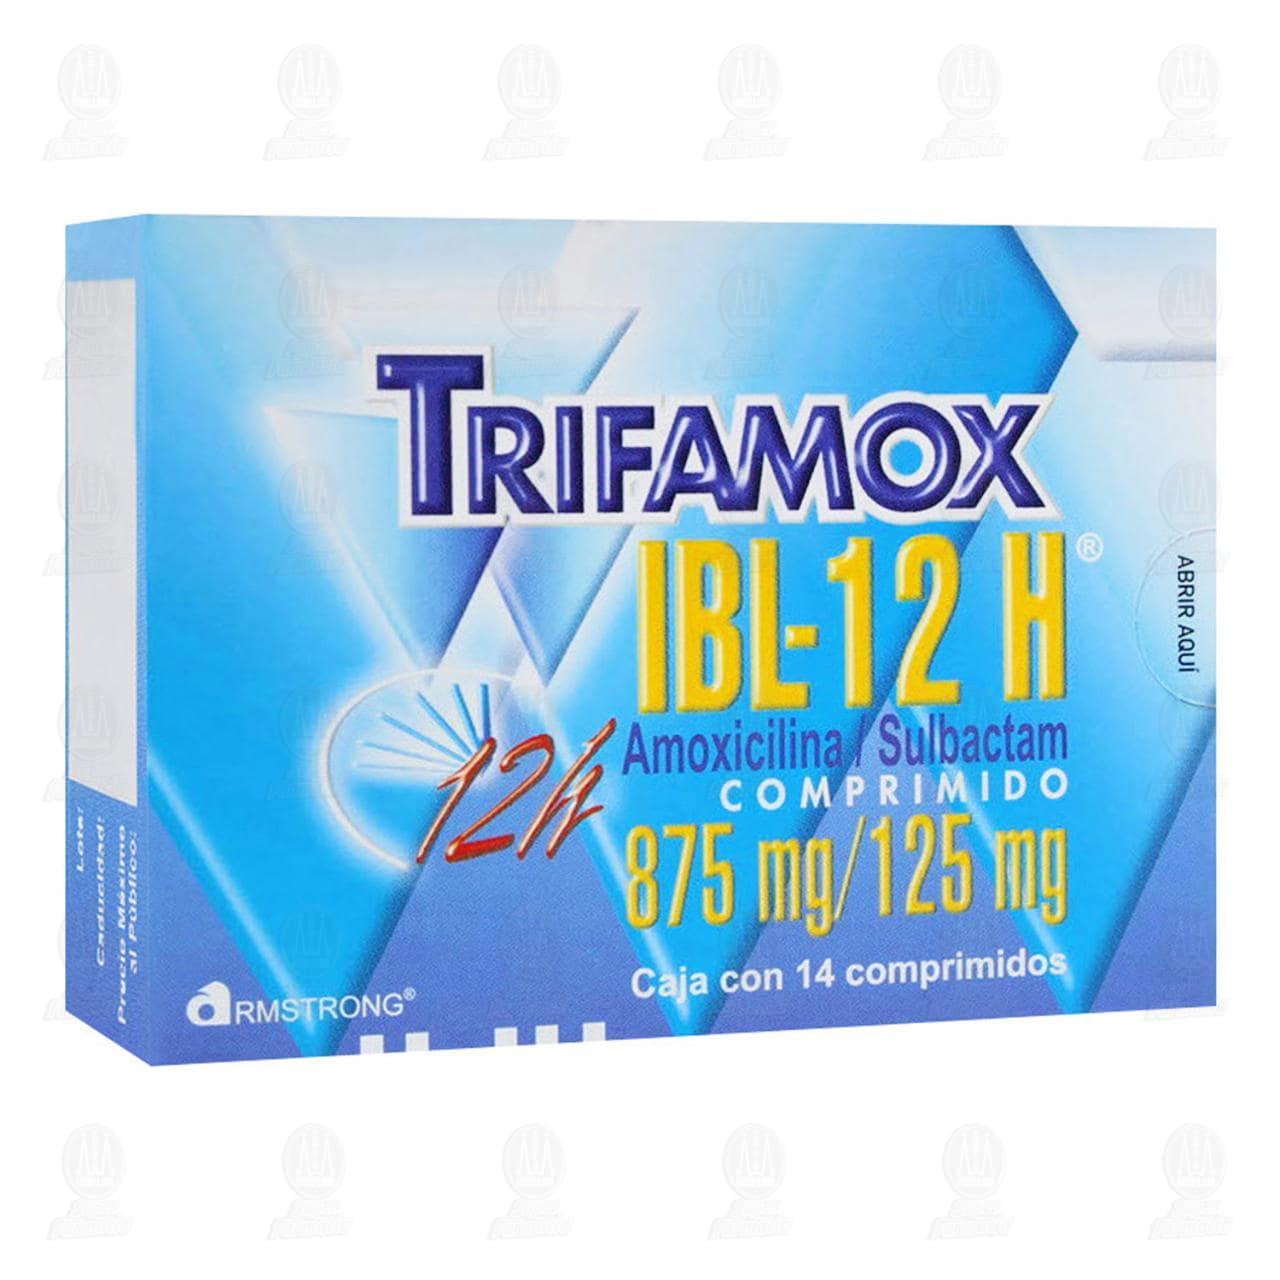 Comprar Trifamox IBL-12 H 875mg/125mg 14 Comprimidos en Farmacias Guadalajara